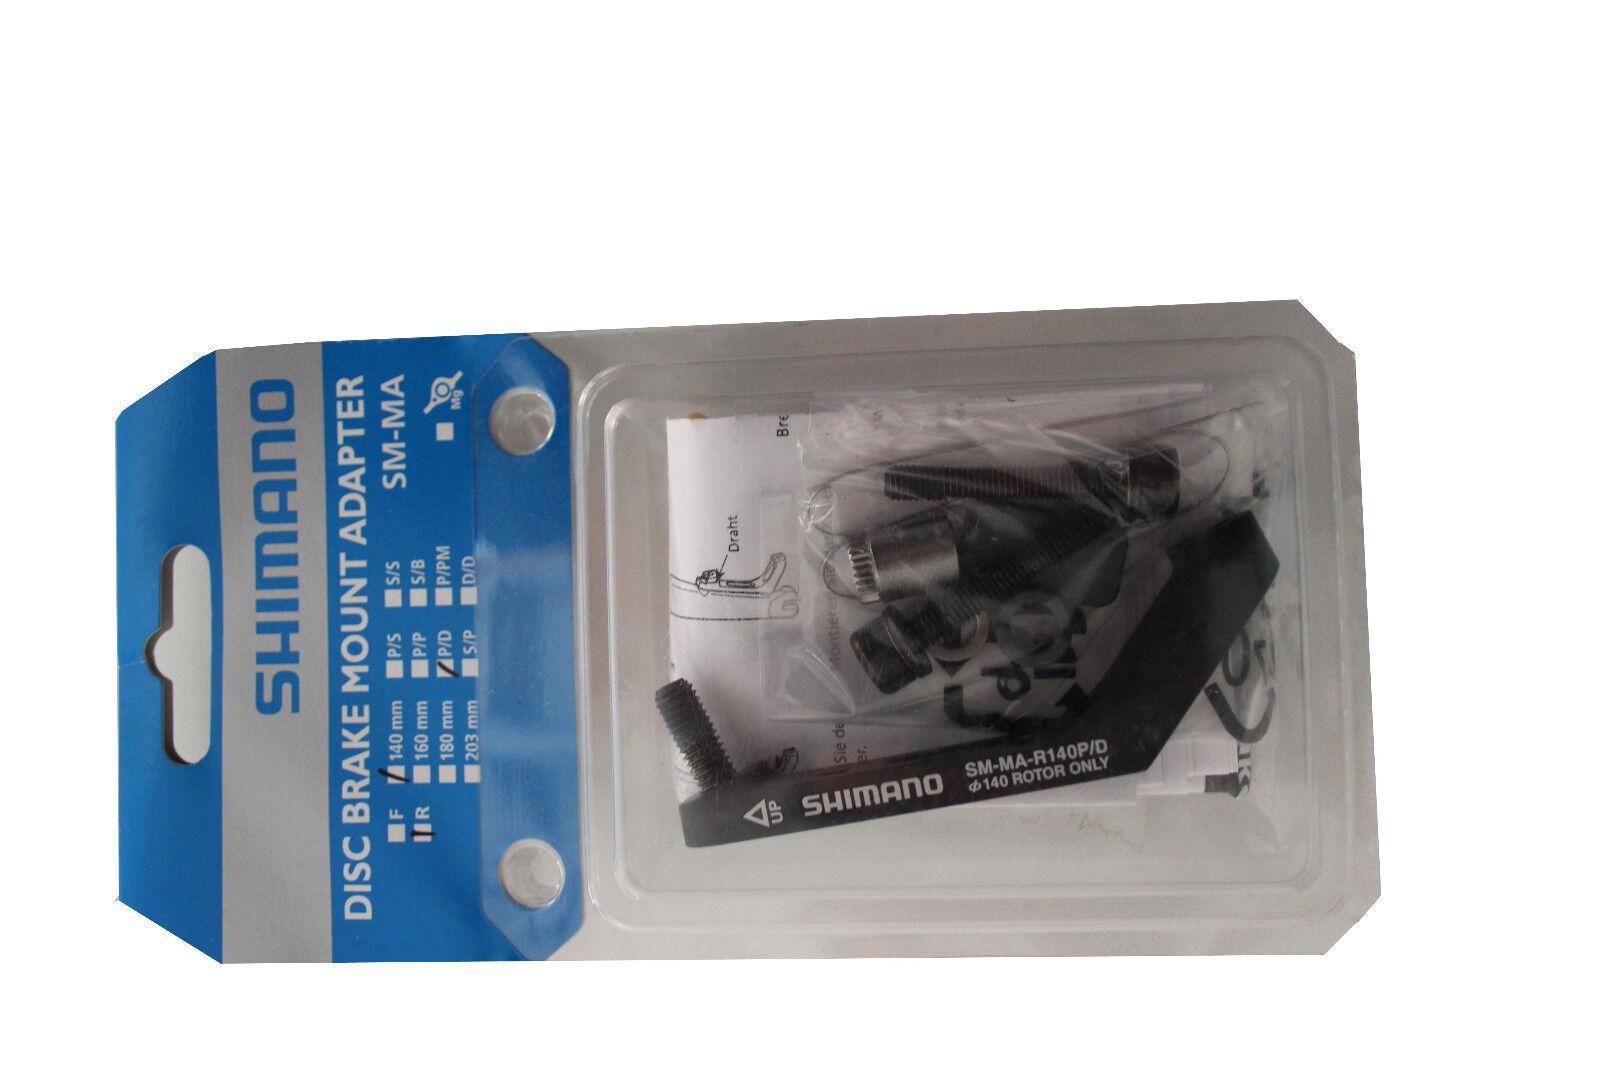 Shimano Sm-Ma-R160 P D Rear Rear Adapter 146 redor